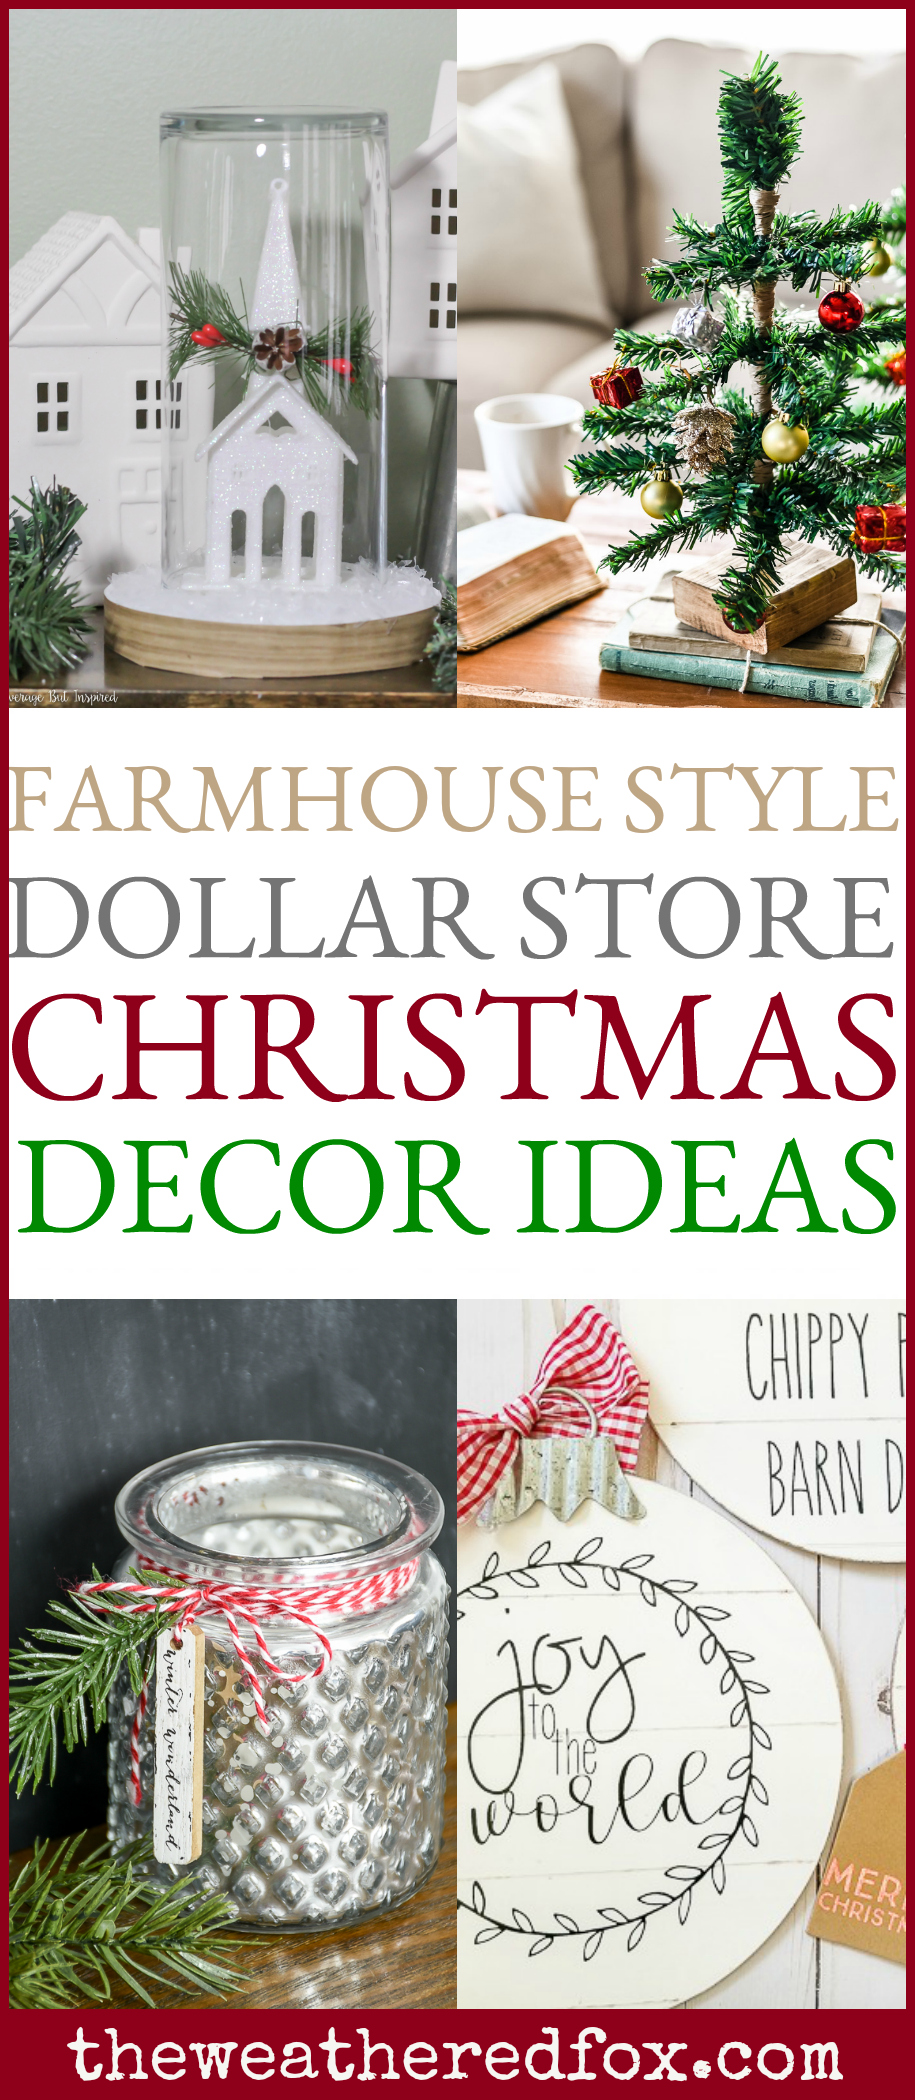 Dollar Store Christmas Decor Ideas The Weathered Fox